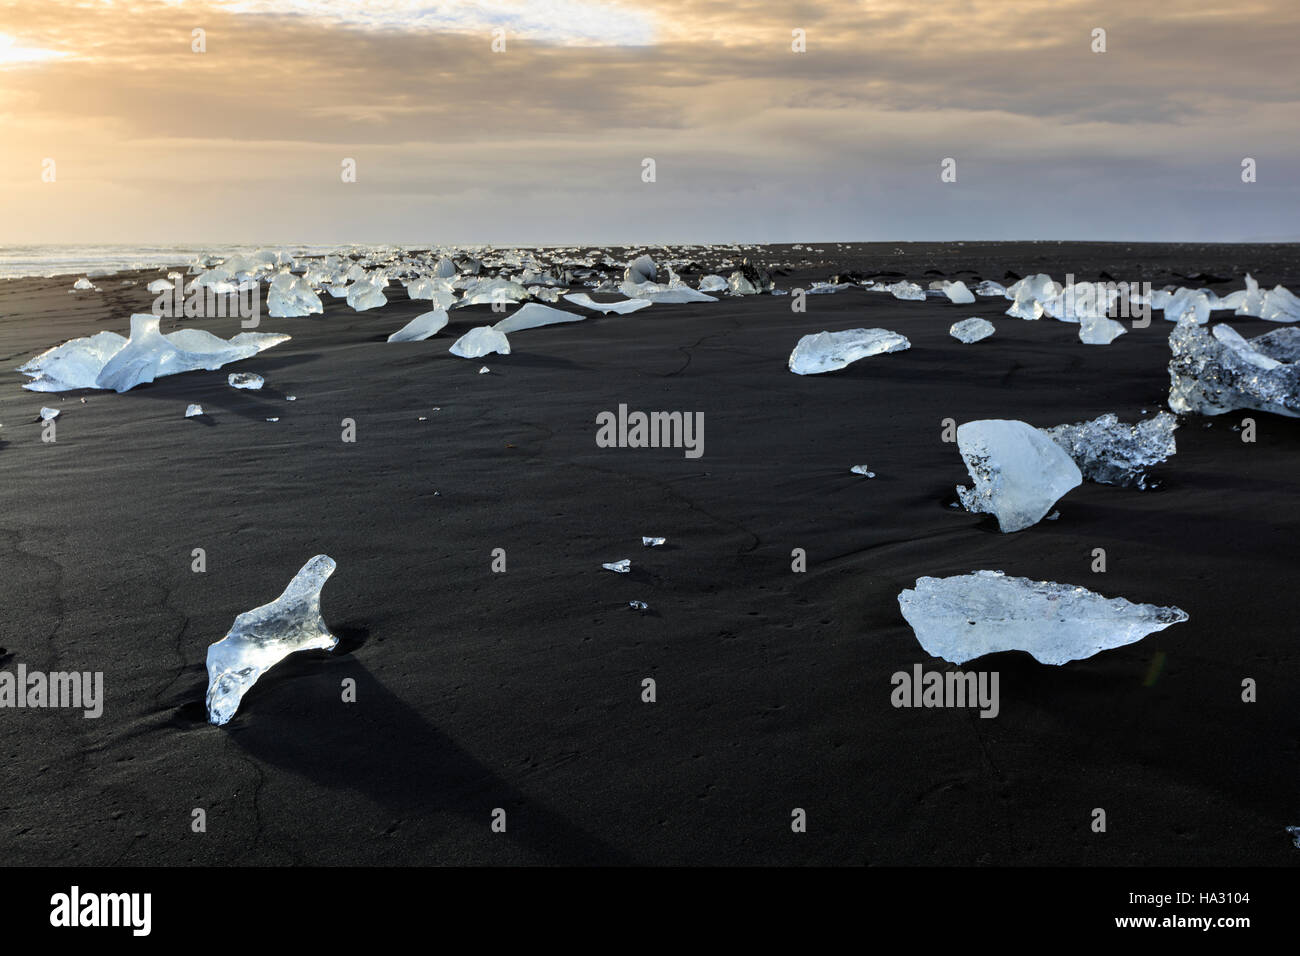 Icebergs on a black sand volcanic beach next to the Jokulsarlon iceberg lagoon in Vatnajokull national park, Iceland - Stock Image